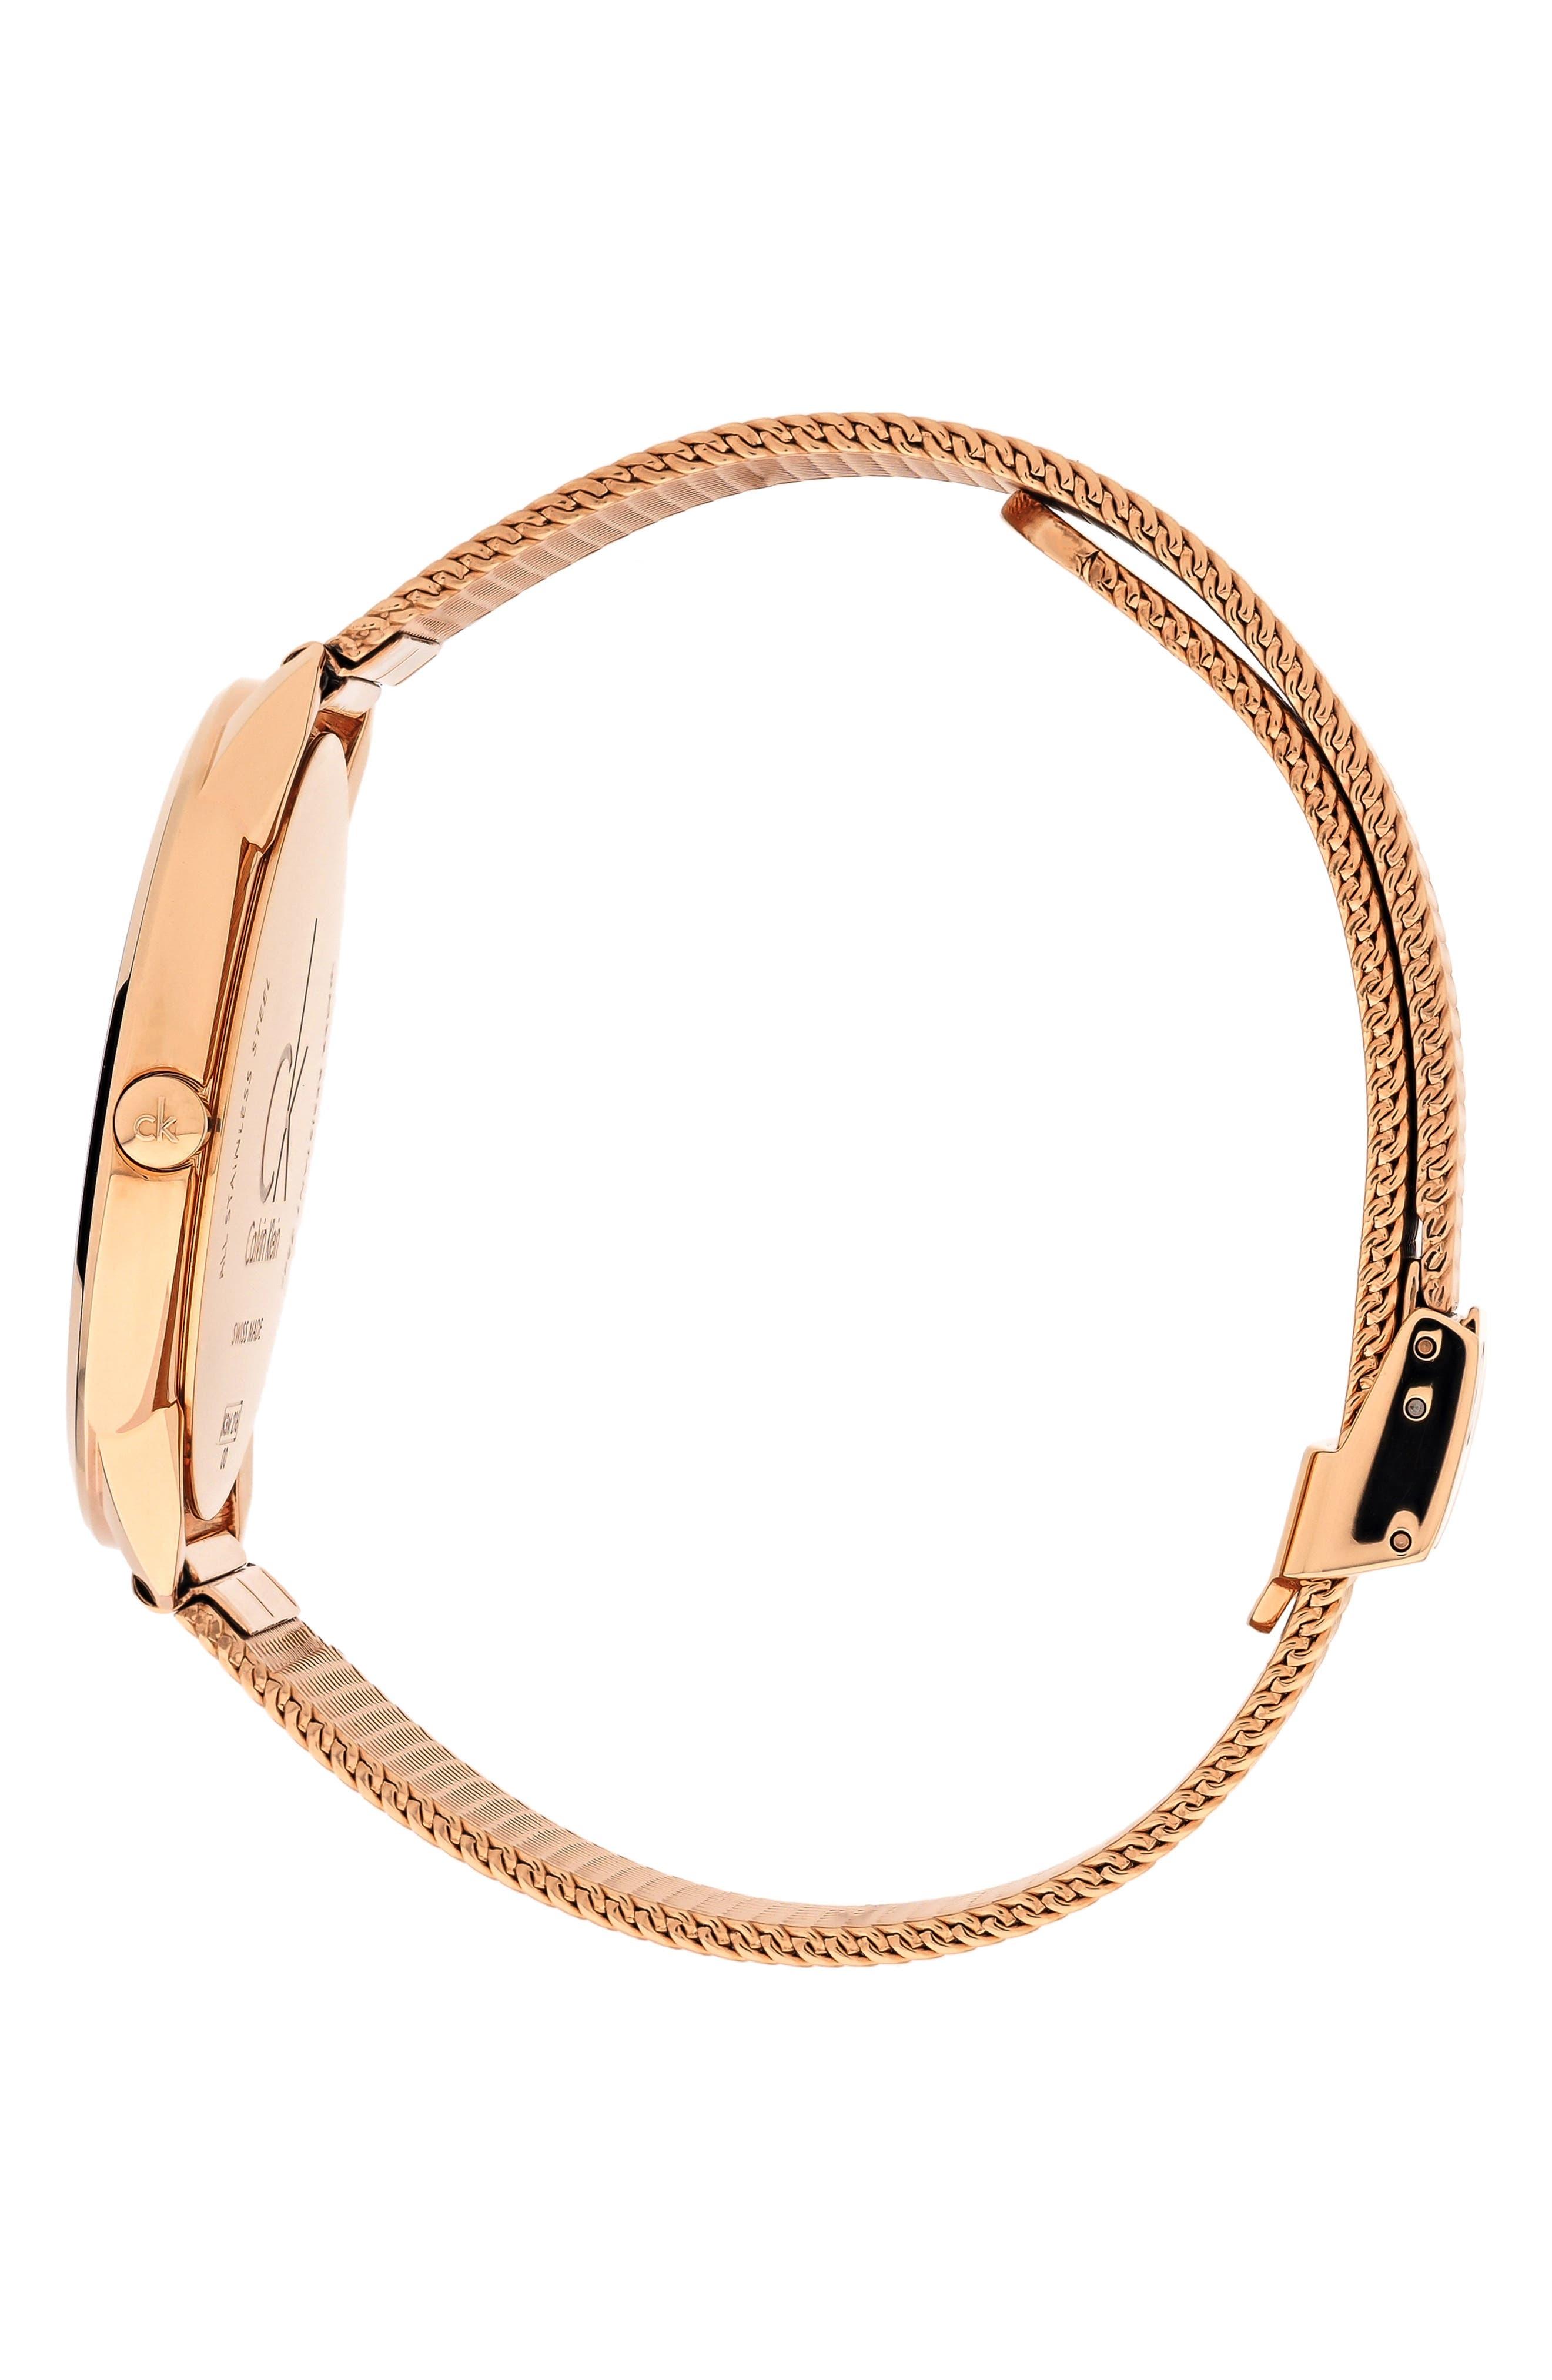 CALVIN KLEIN, Minimal Mesh Strap Watch, 40mm, Alternate thumbnail 3, color, ROSE GOLD/ BLACK/ ROSE GOLD